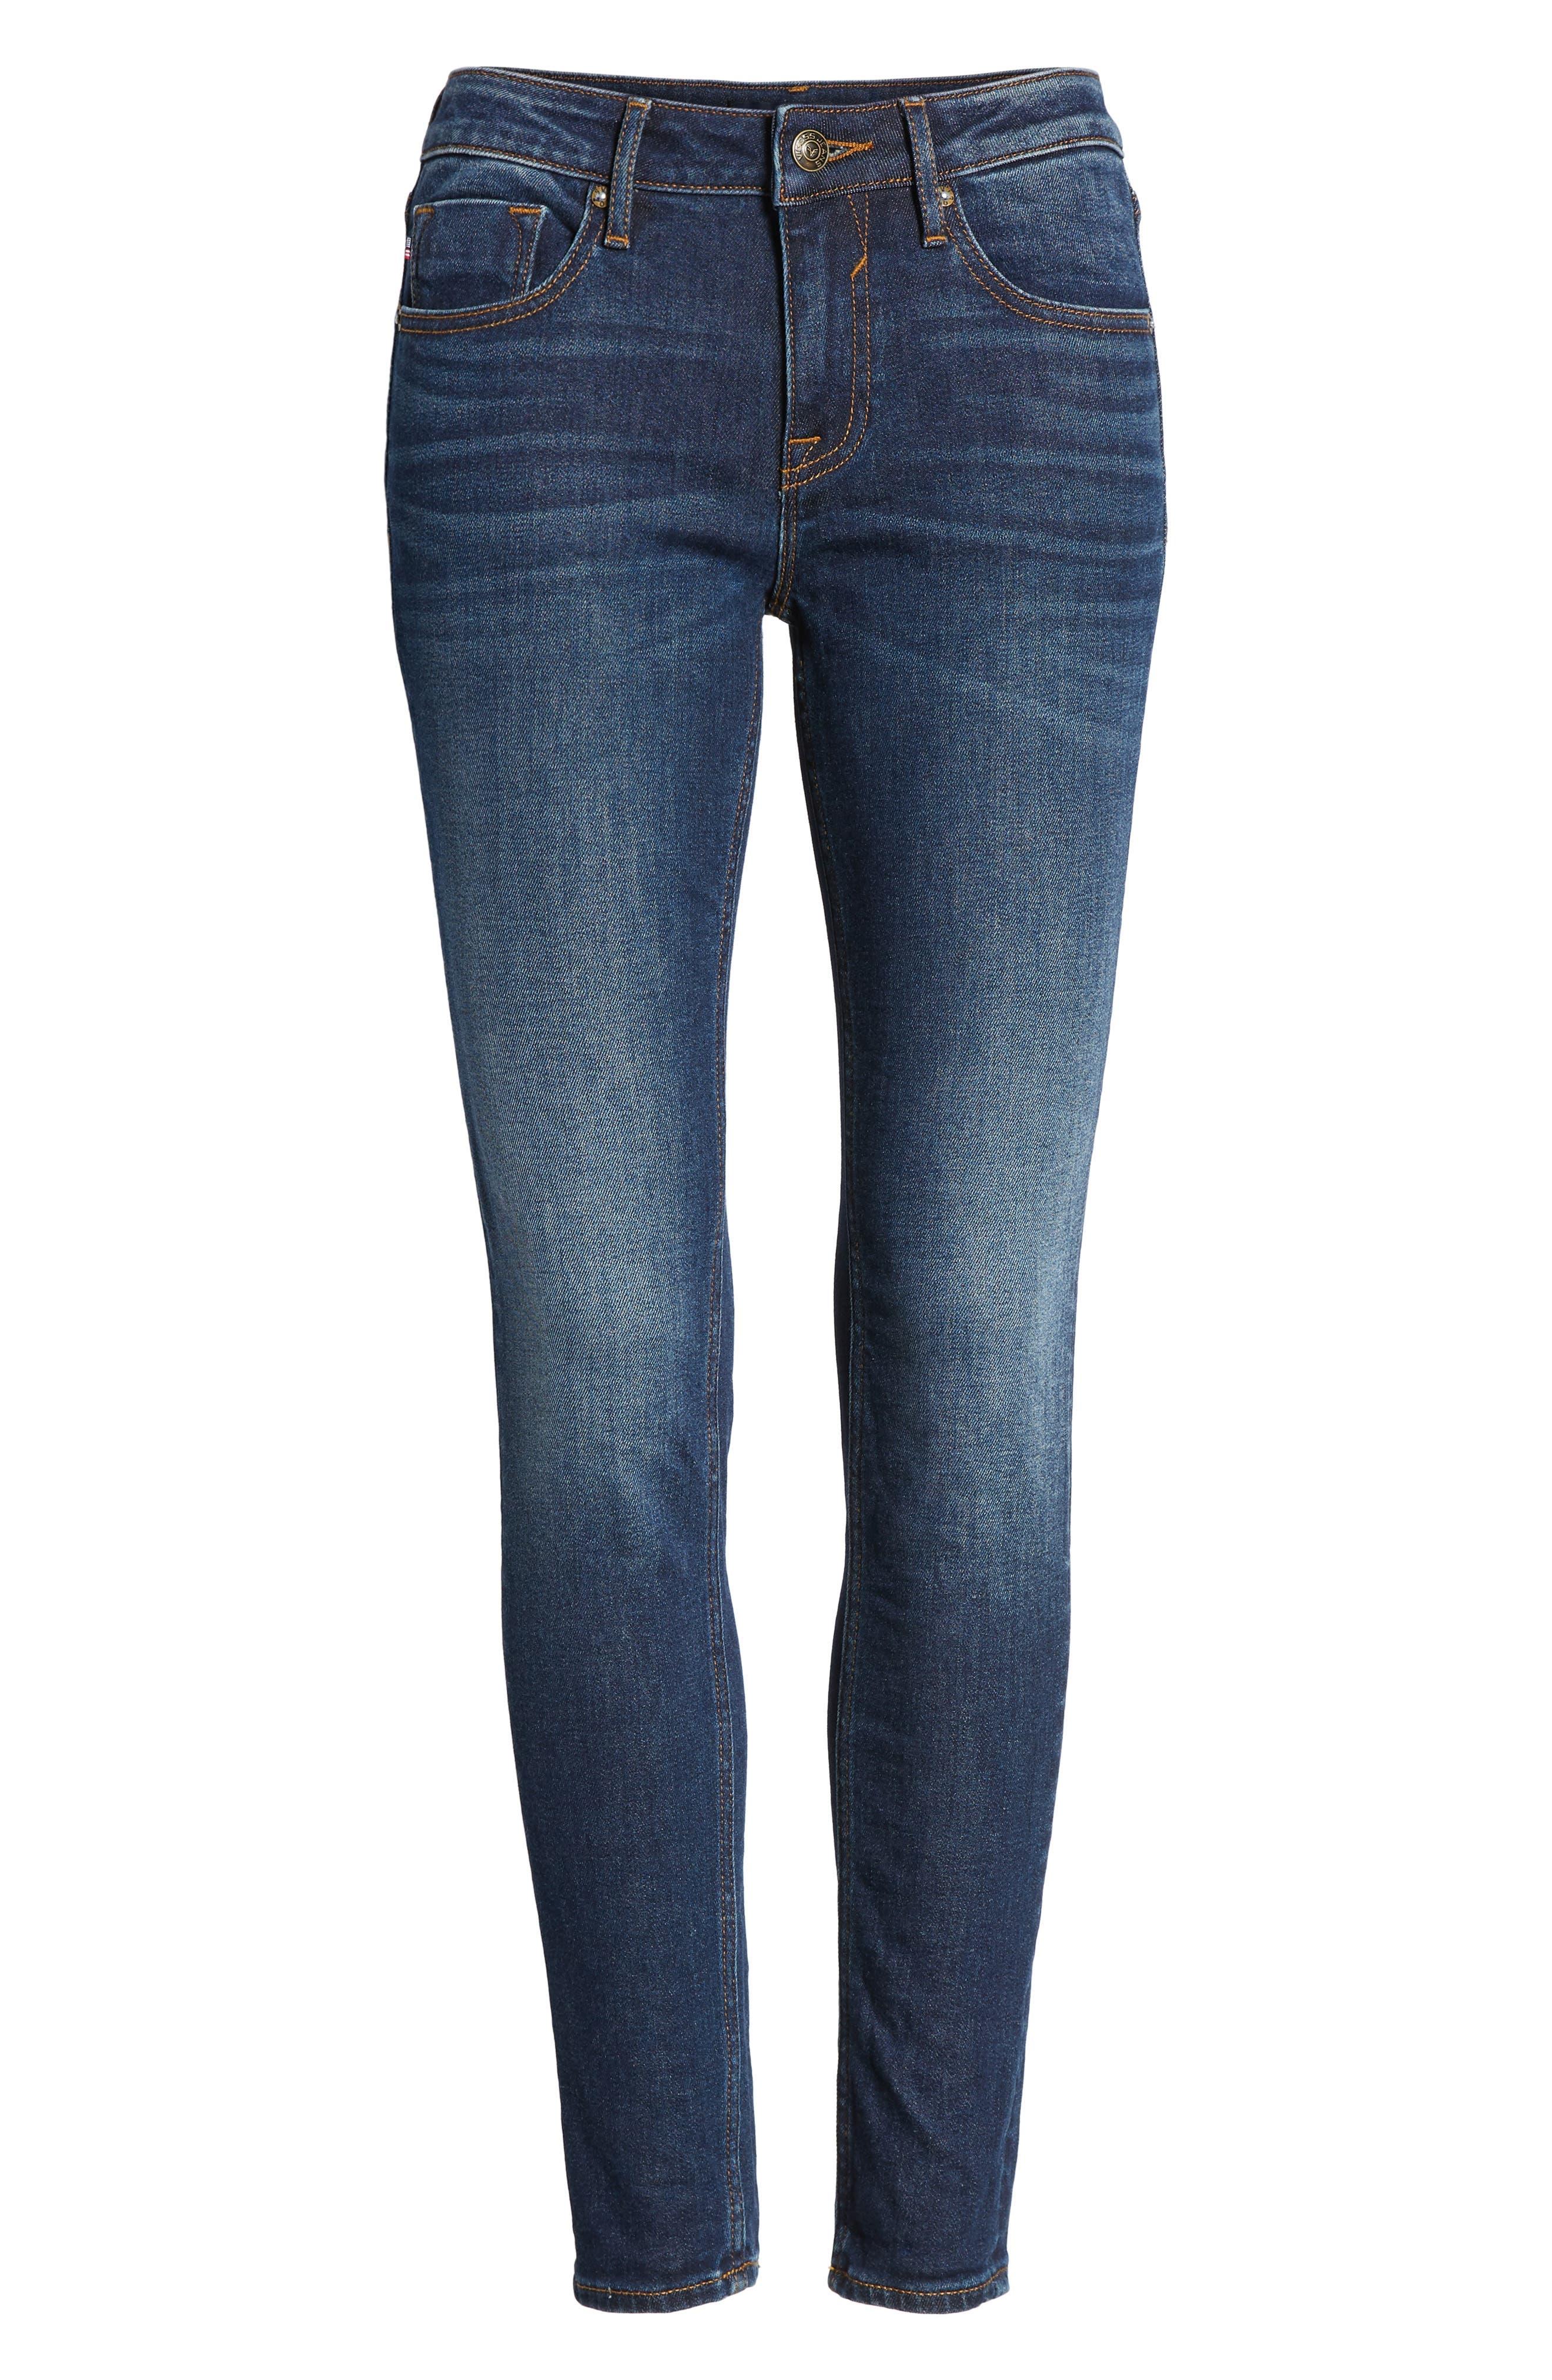 Jagger Skinny Jeans,                             Alternate thumbnail 7, color,                             DARK WASH